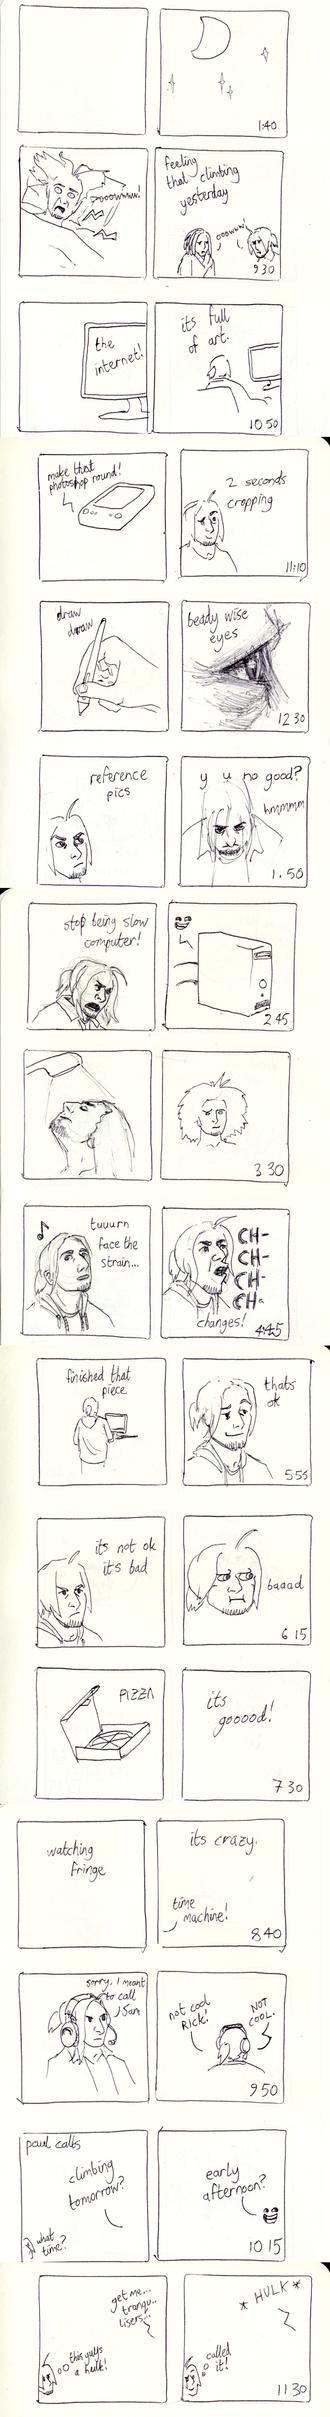 HOURLY COMICS 2011 day 4 by kingaby